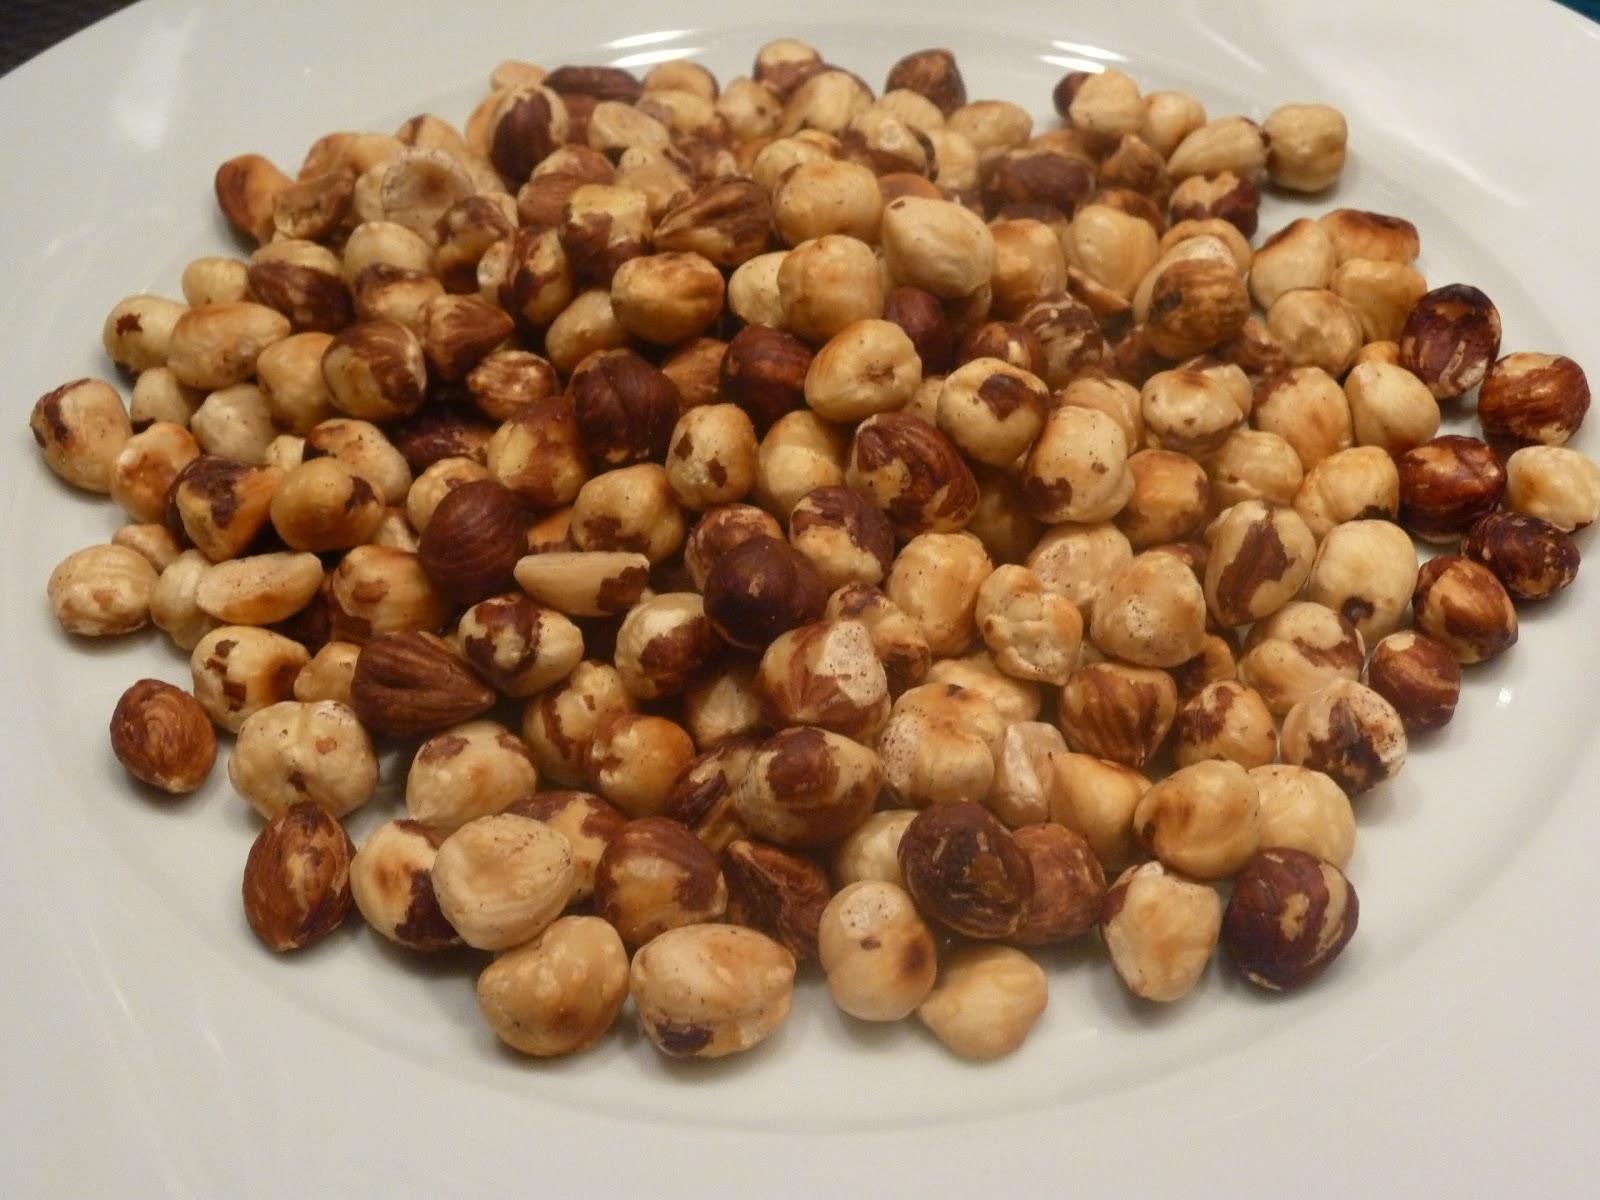 rosta hasselnötter i ugnen